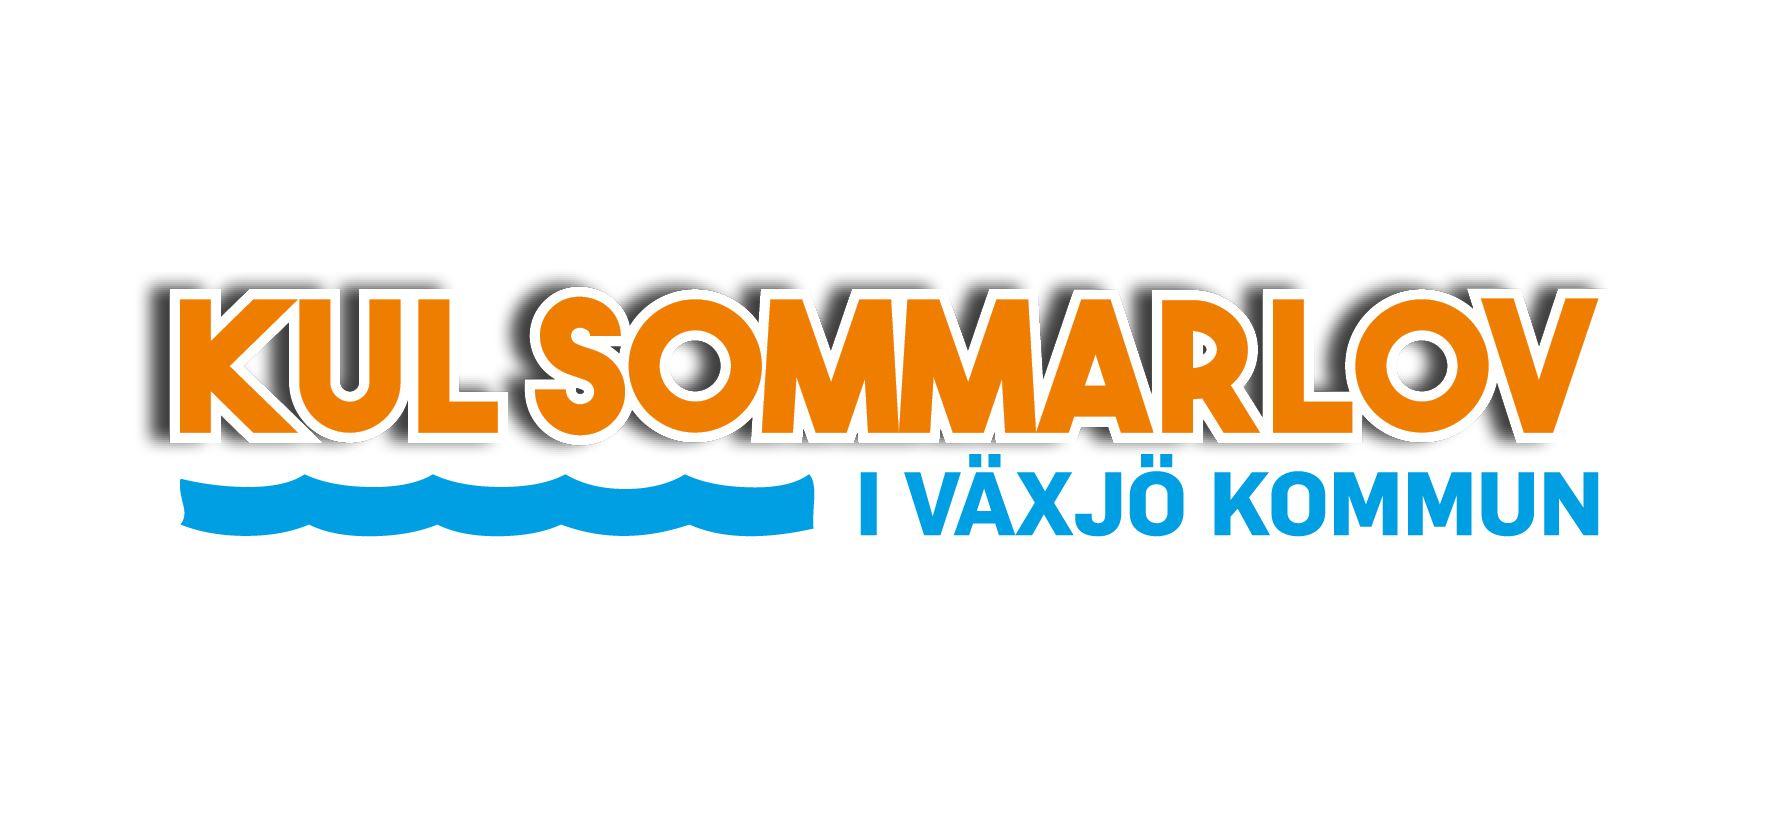 Kul sommarlov: Idrottssommar på Teleborg